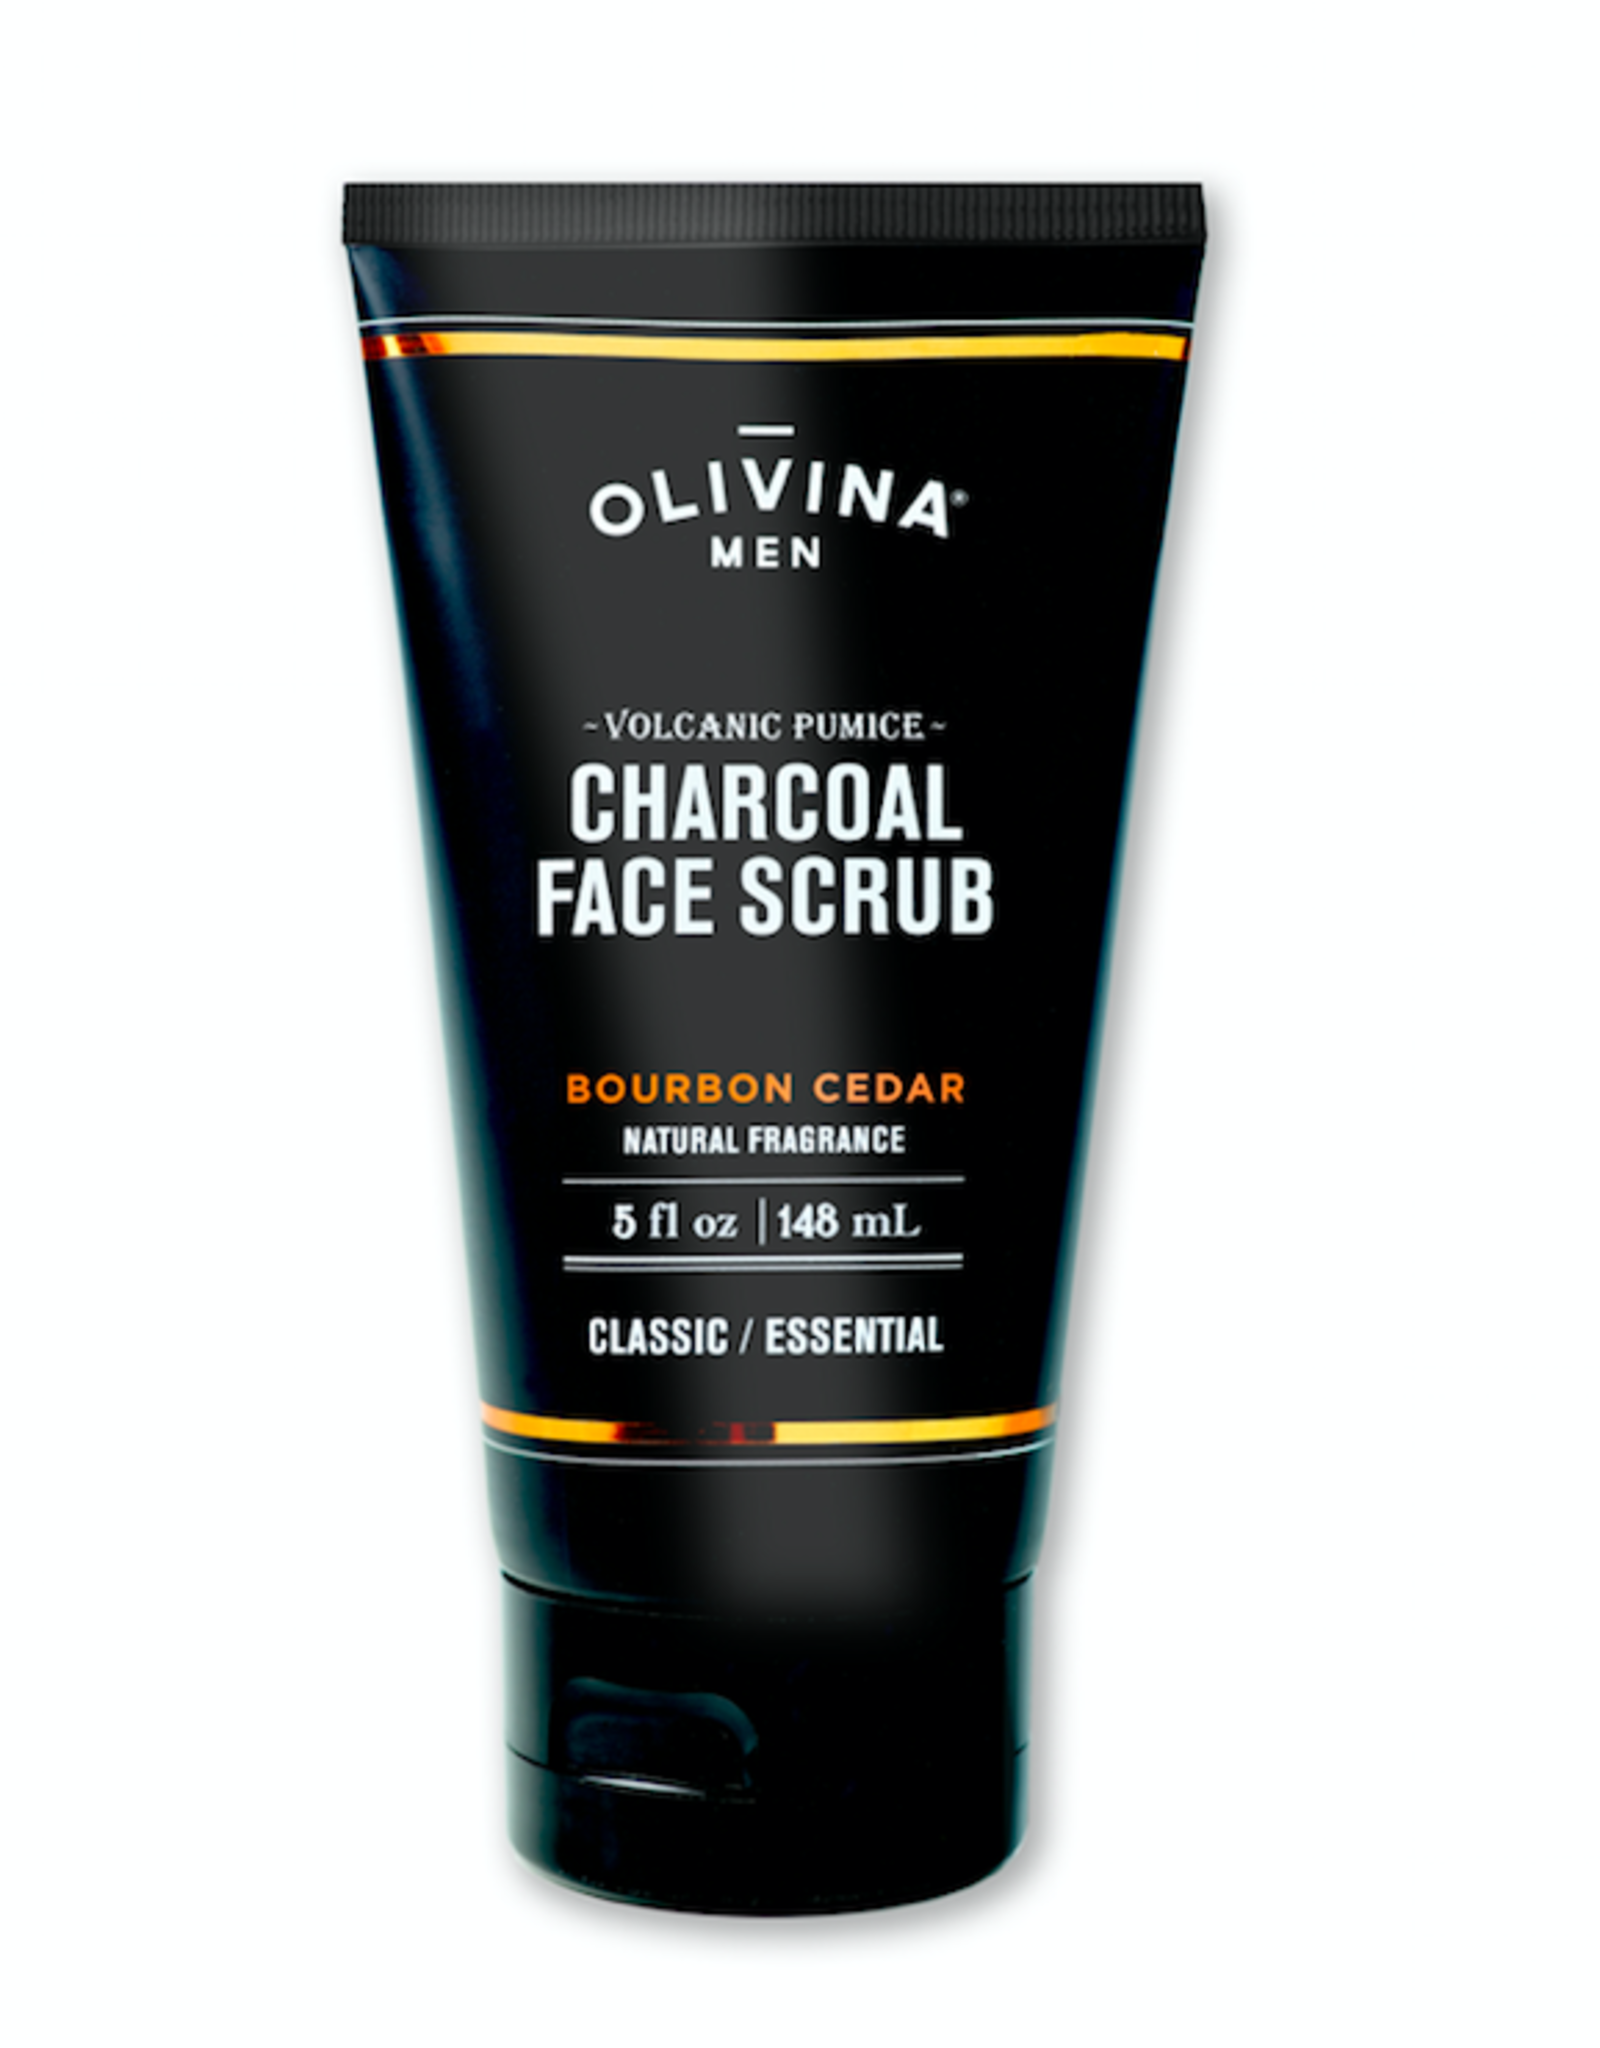 OM Charcoal Face Scrub-Bourbon Cedar